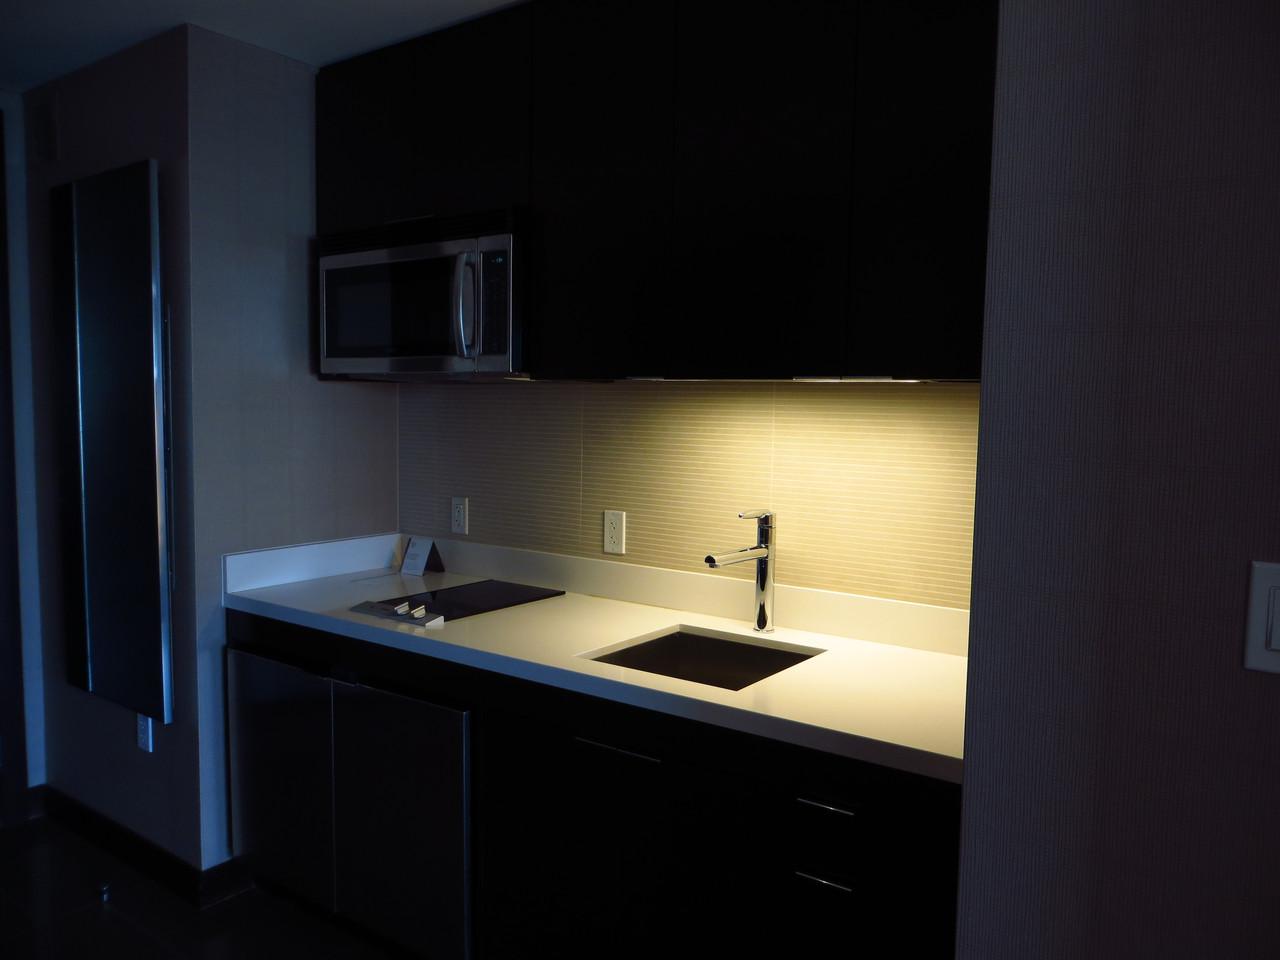 vegas hotels with kitchen americana island vdara hotel and spa  las elsie hui